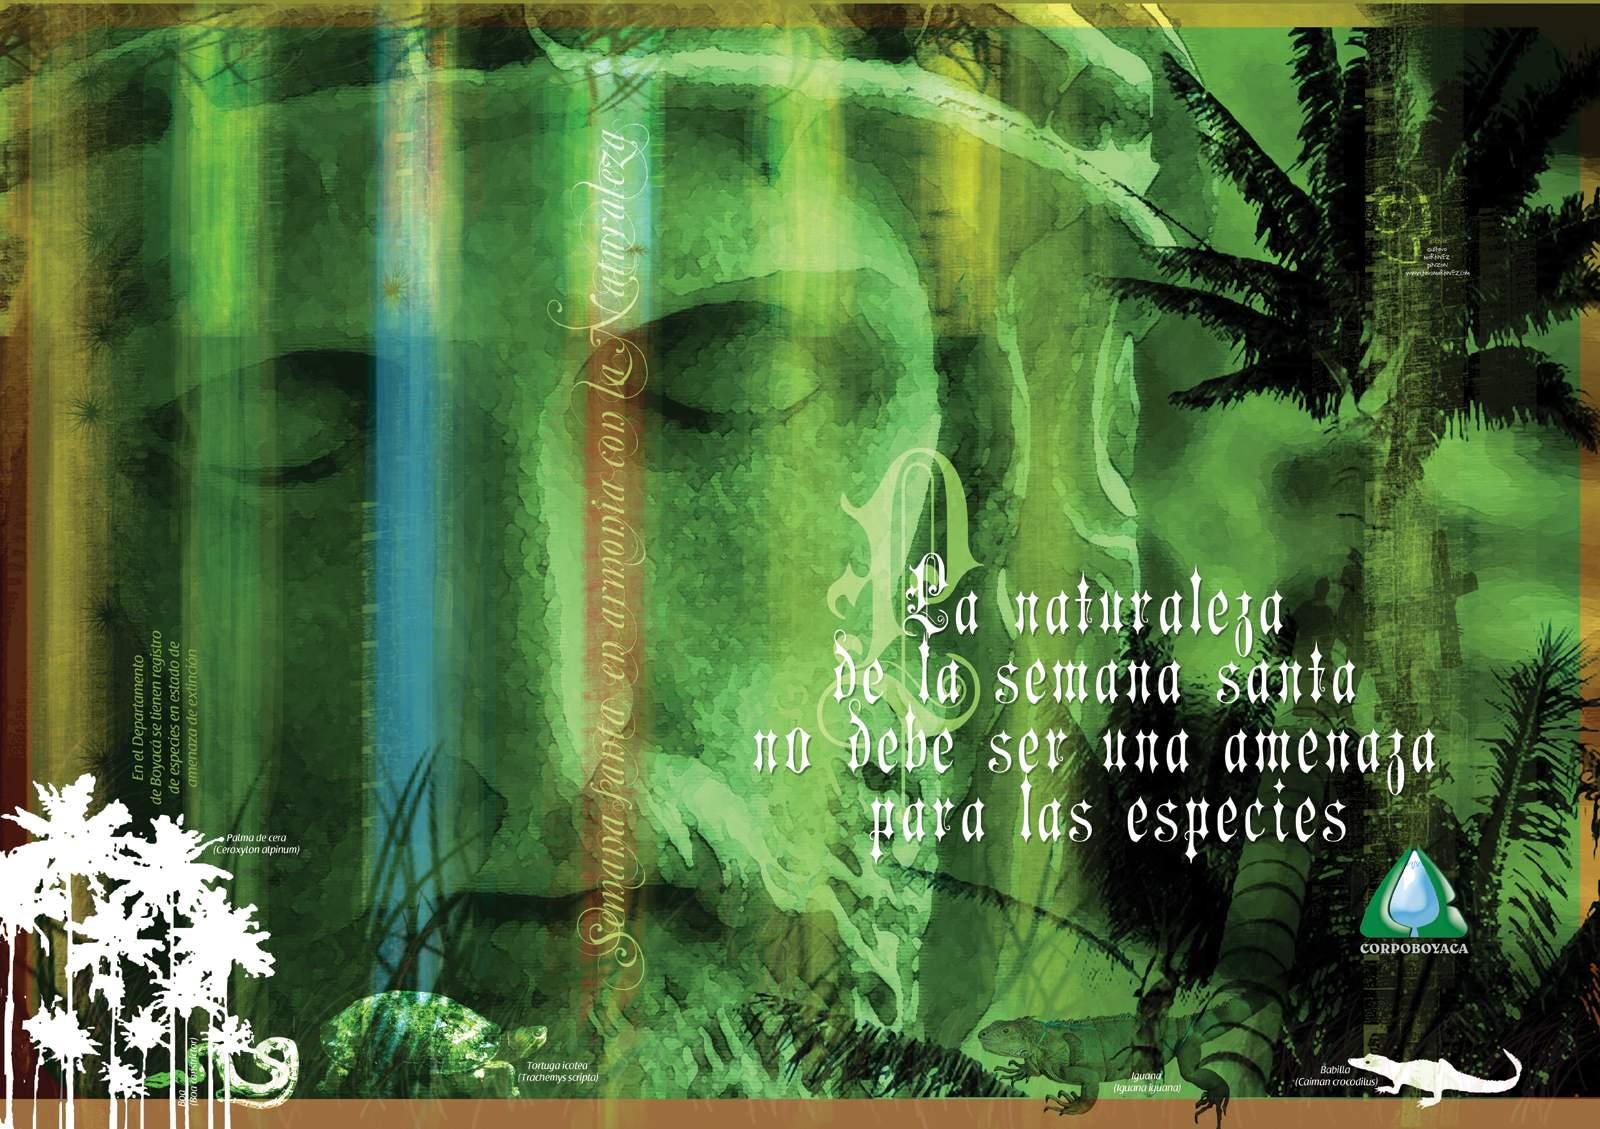 Semana Santa de la Naturaleza